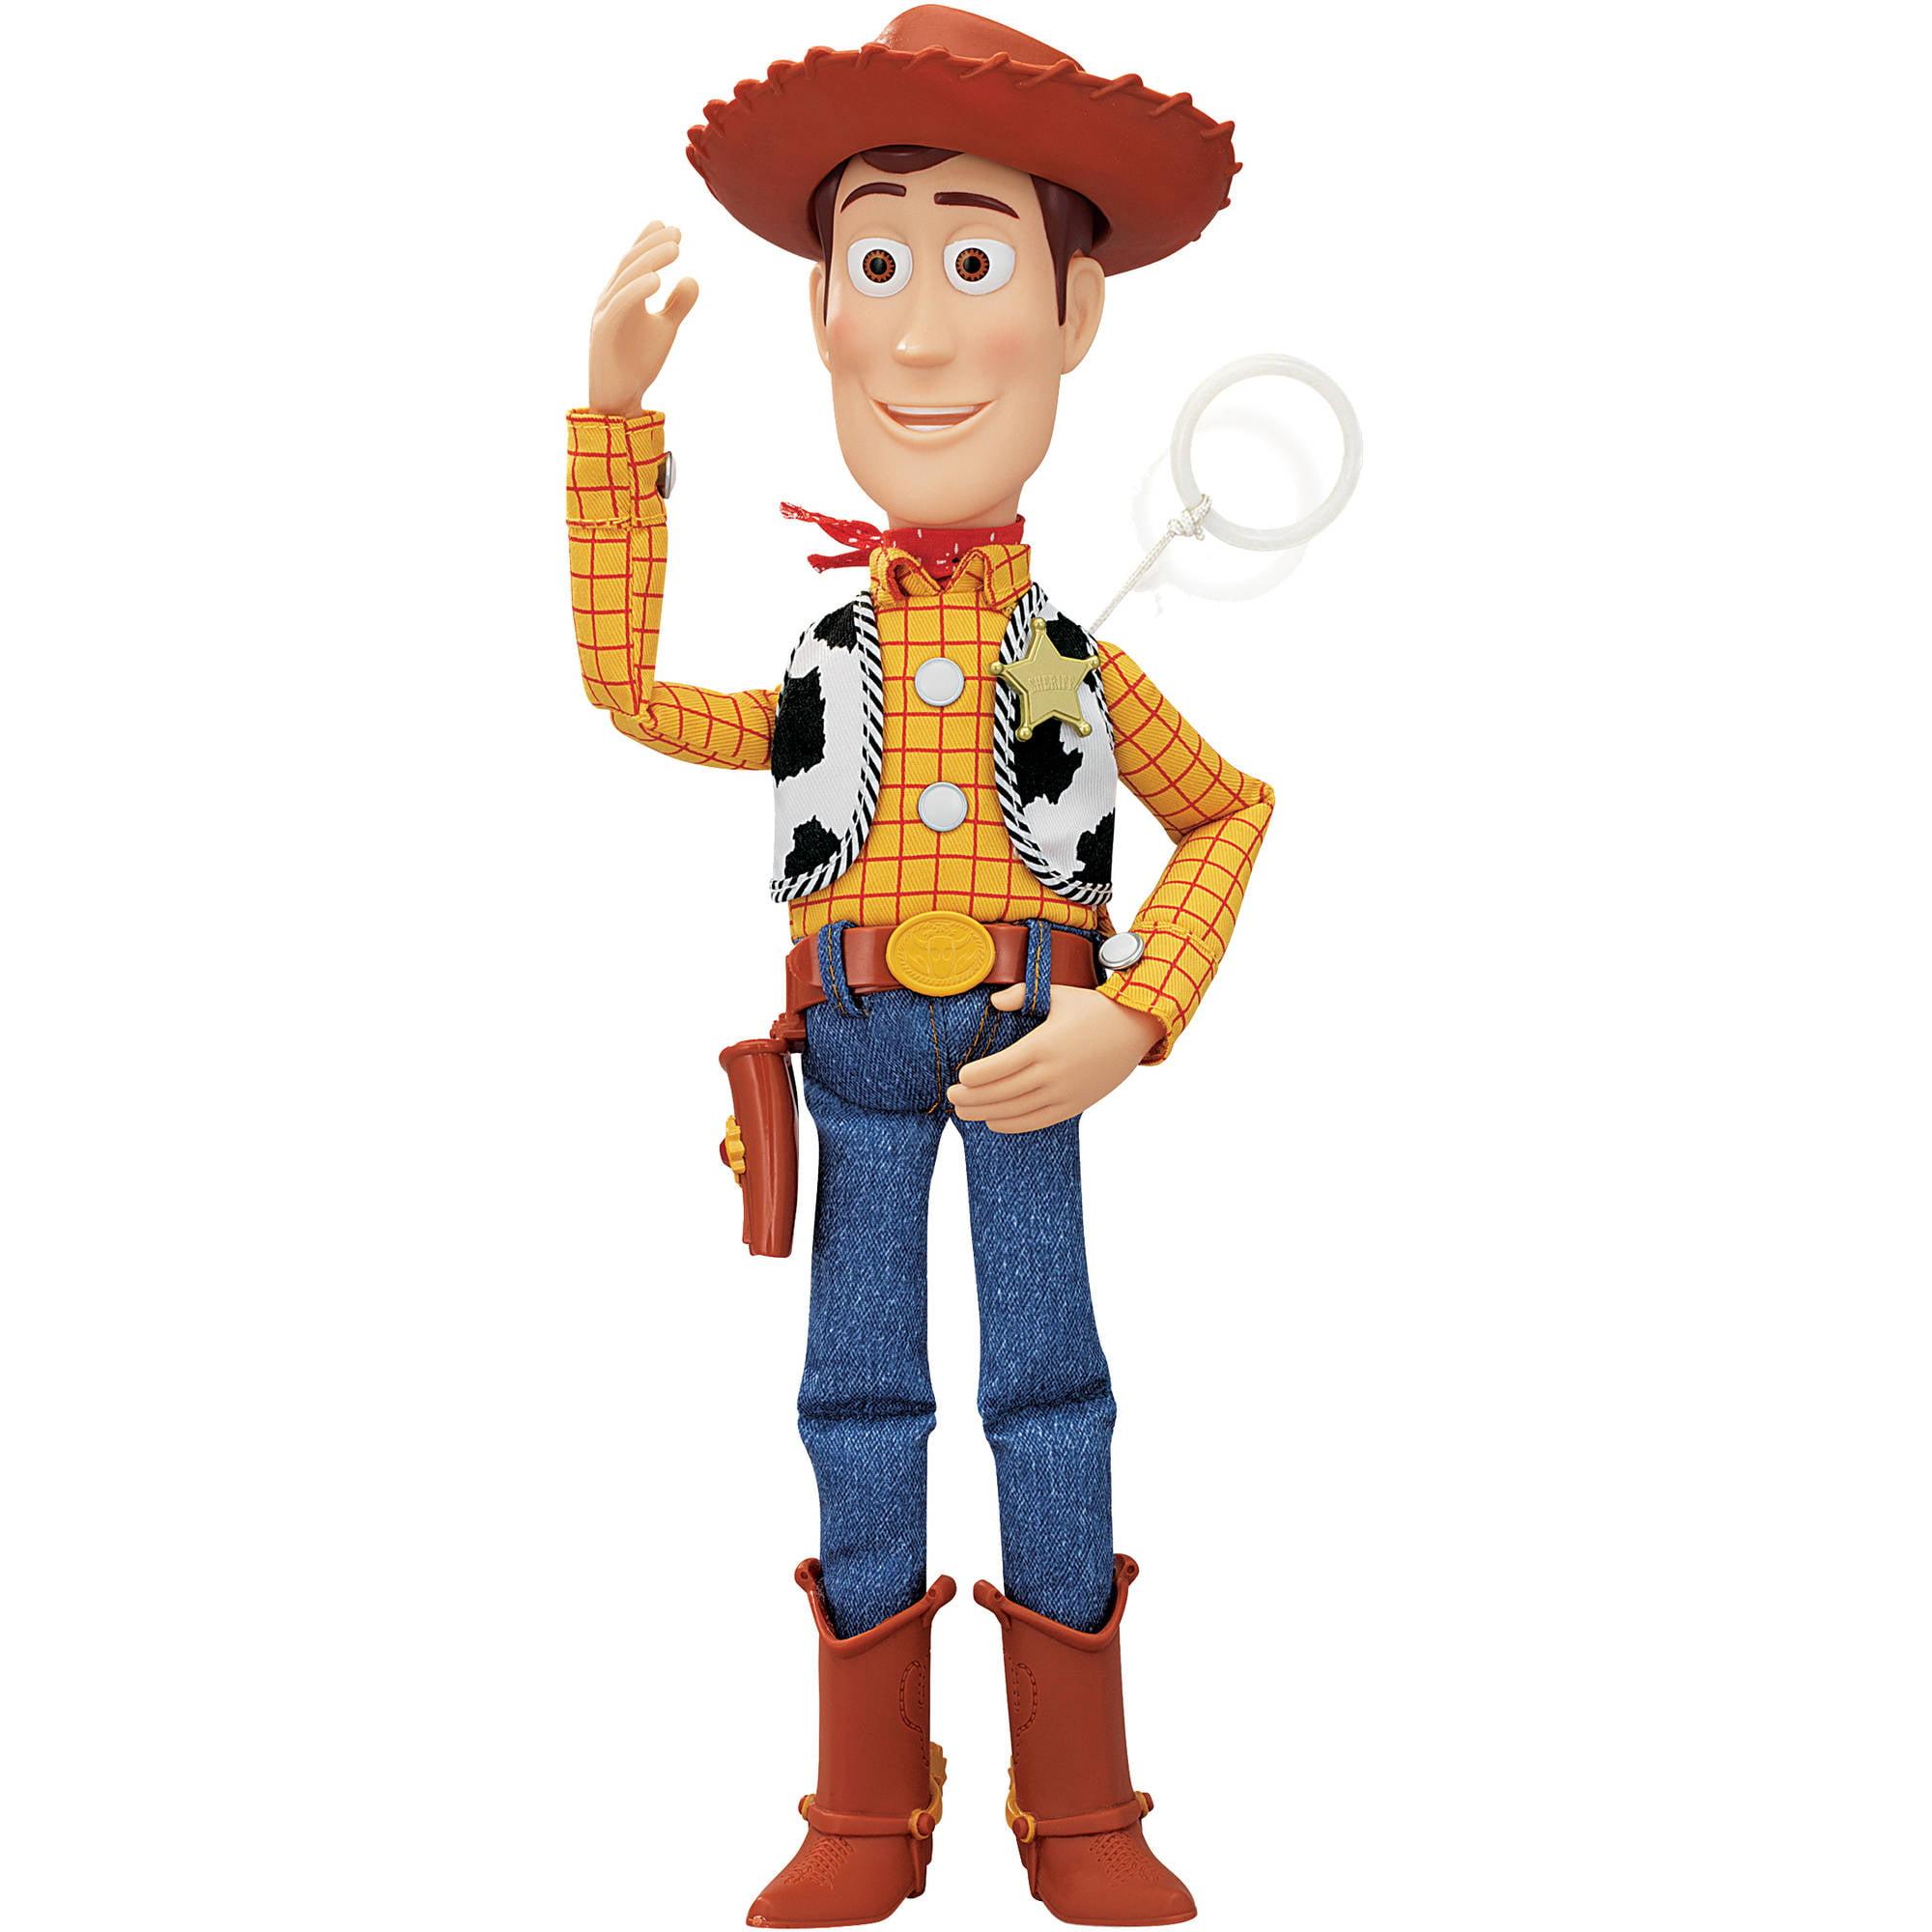 Disney - Toy Story Talking Sheriff Woody Action Figure